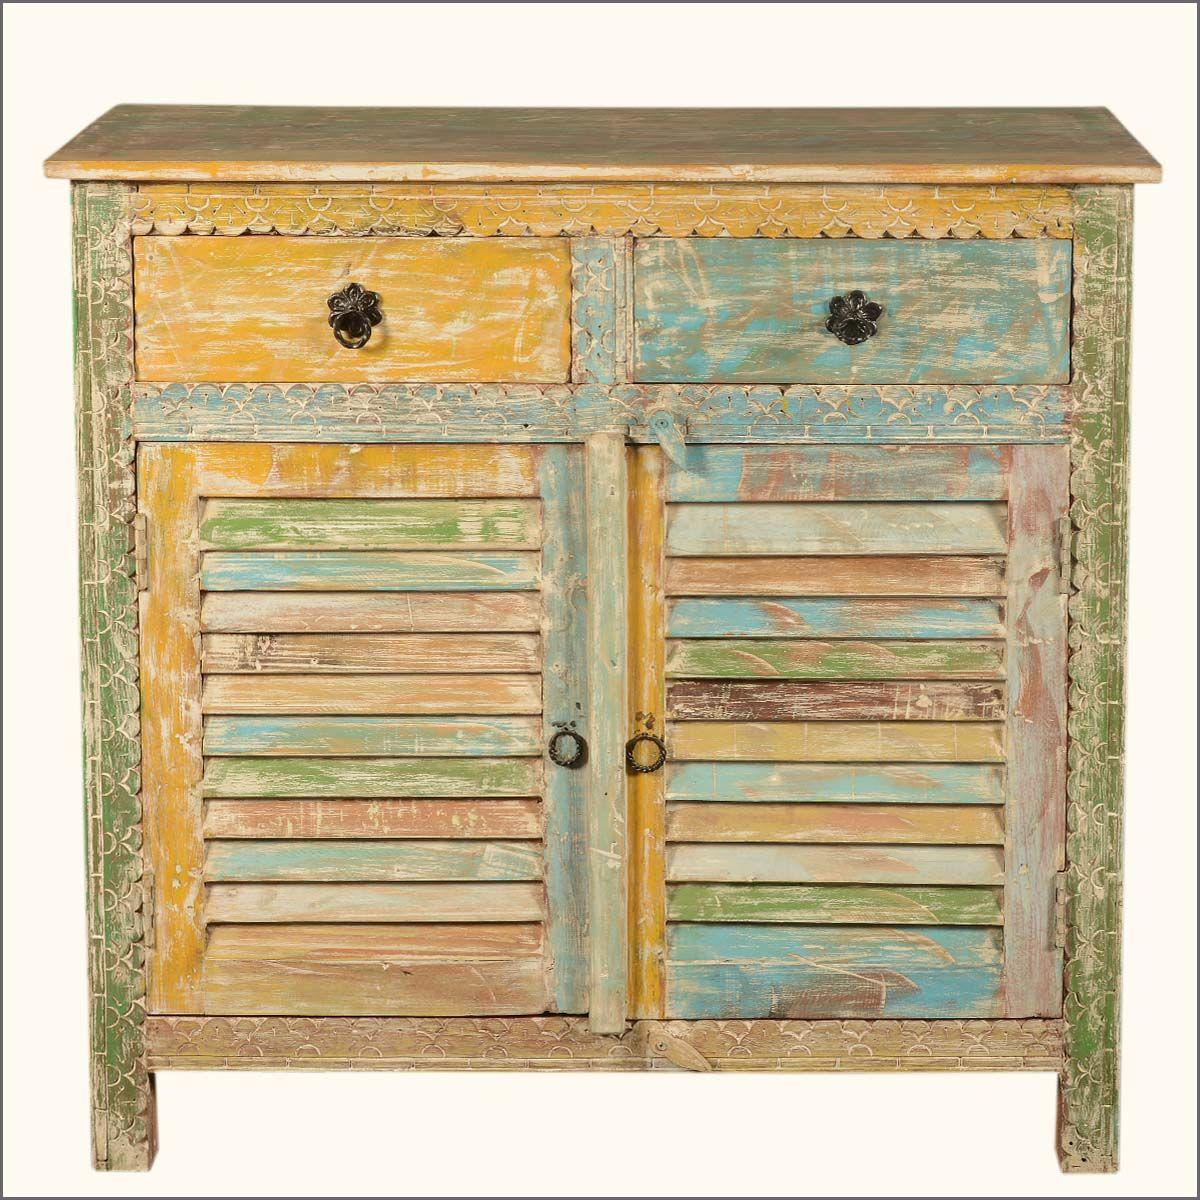 Attica Rustic Reclaimed Wood Shutter Door 9 Drawer Sideboard ...